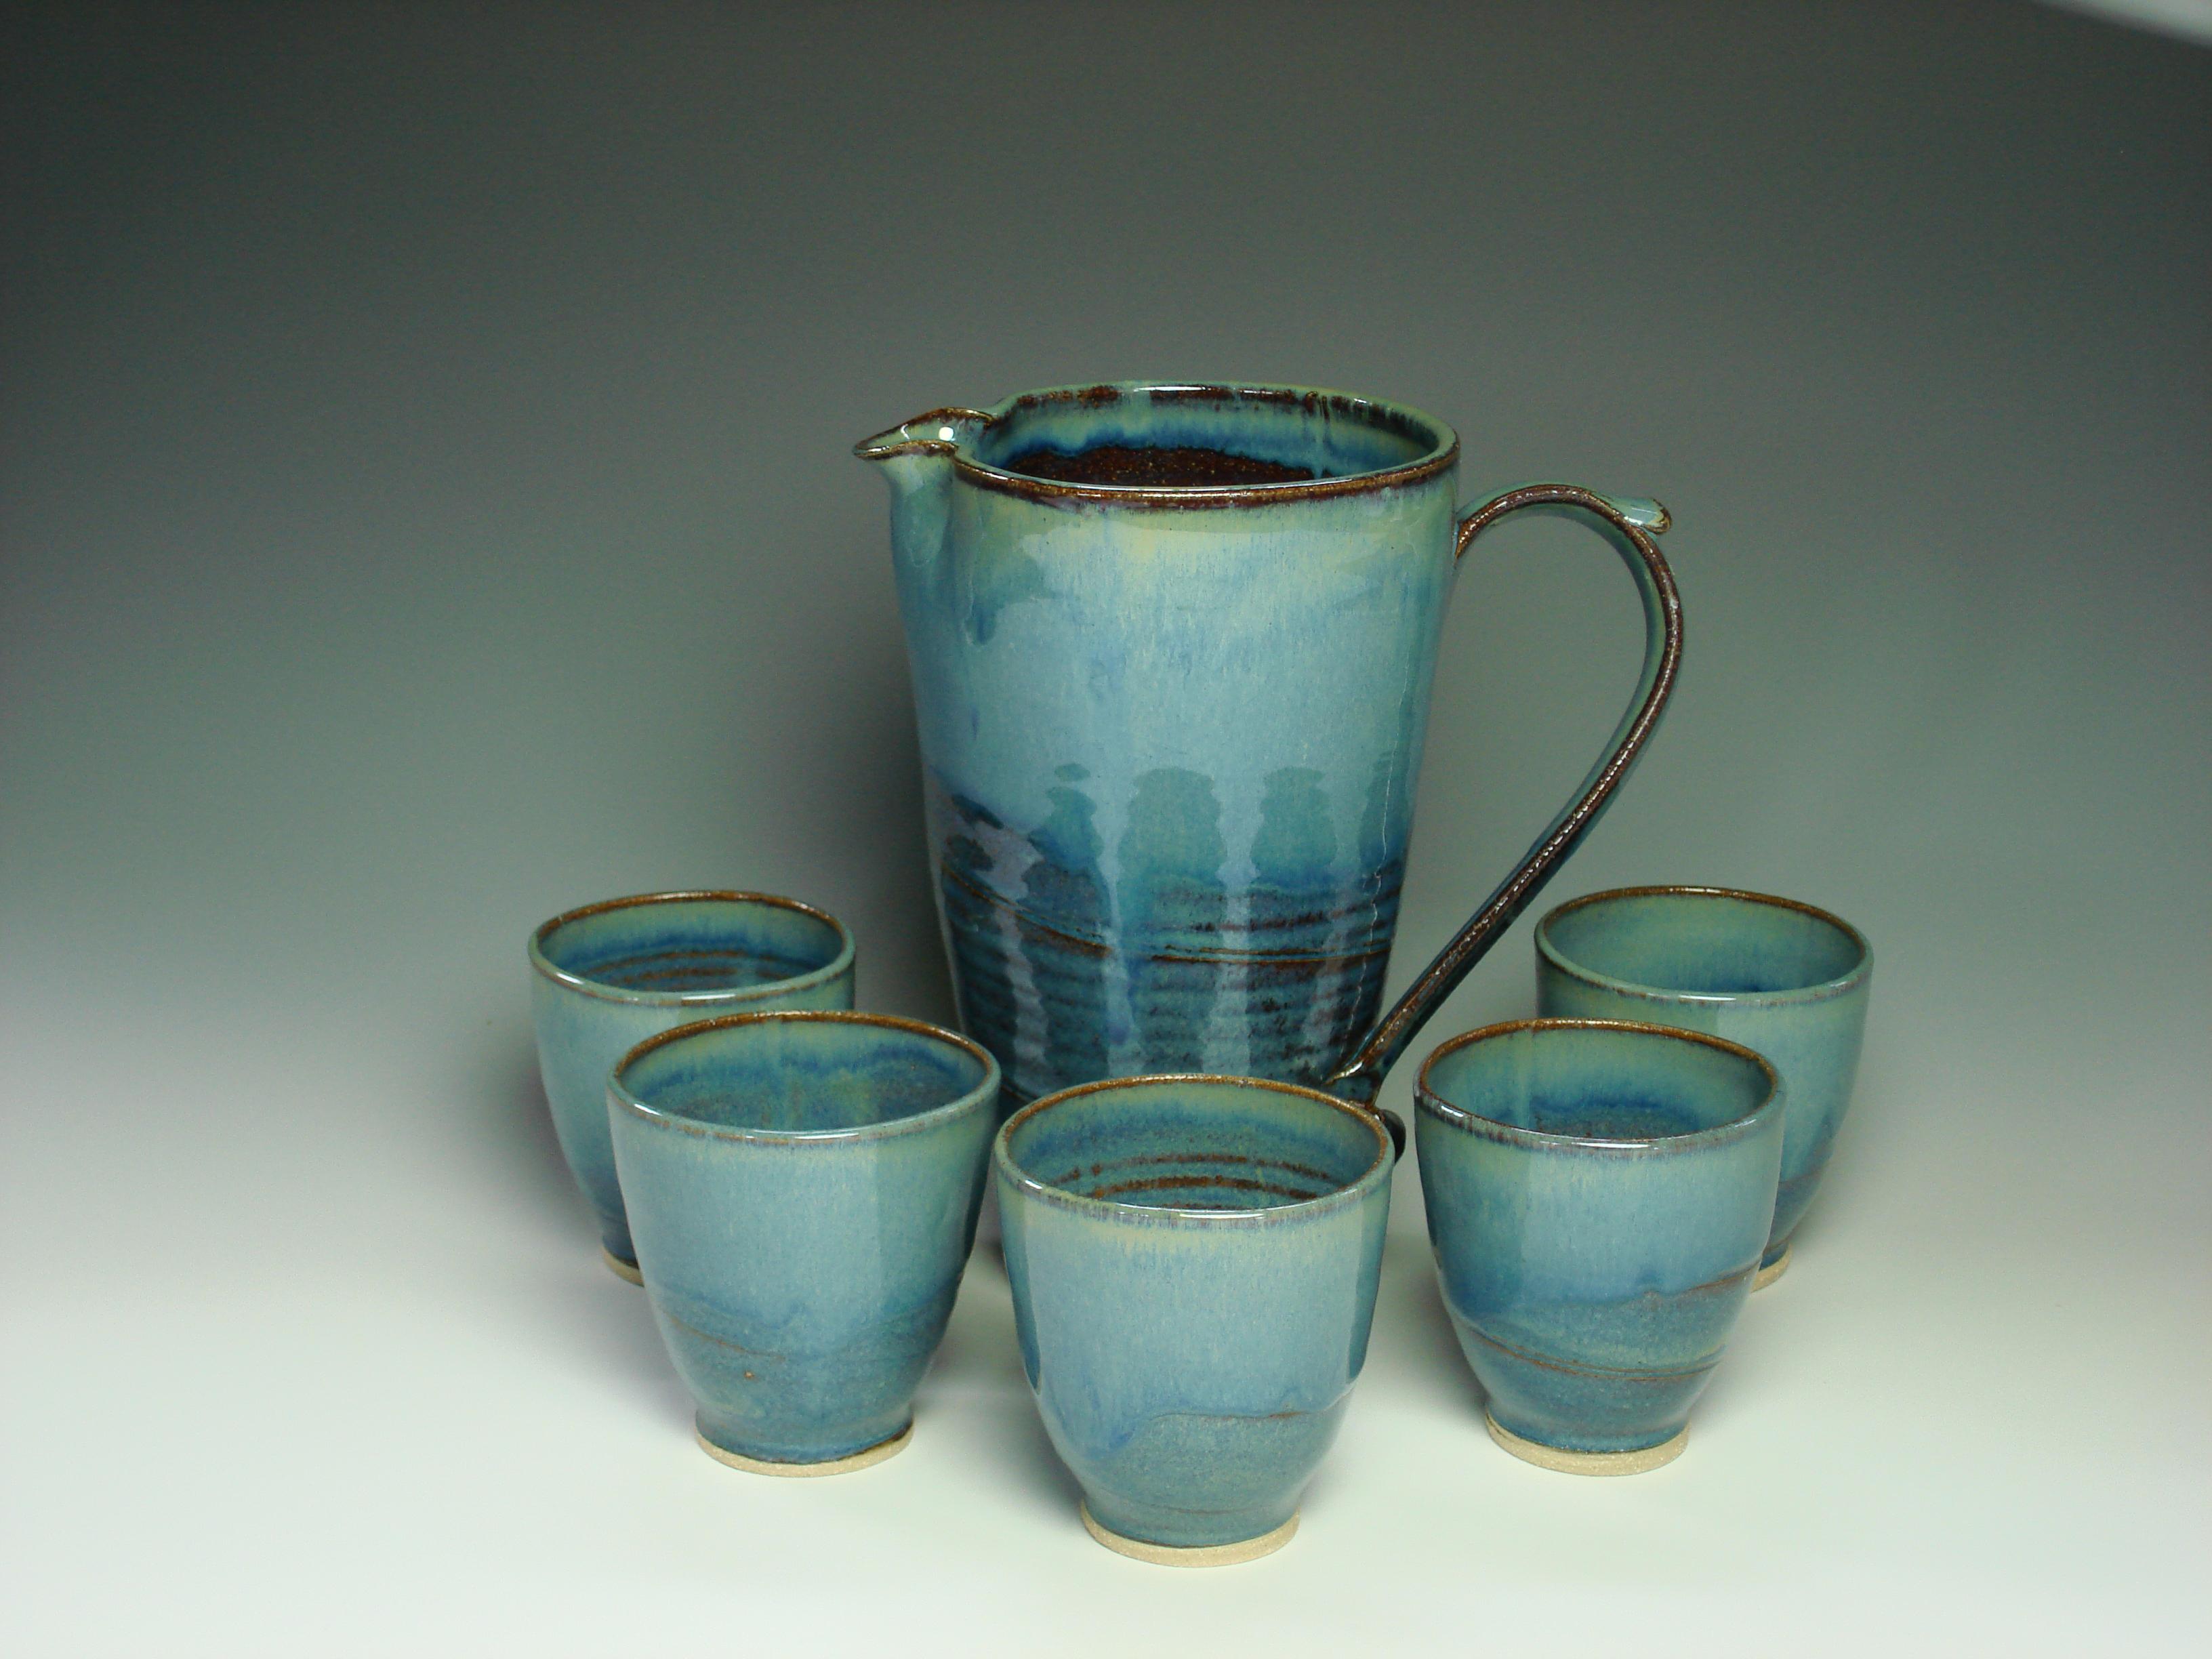 blue-jug-and-beakers-2